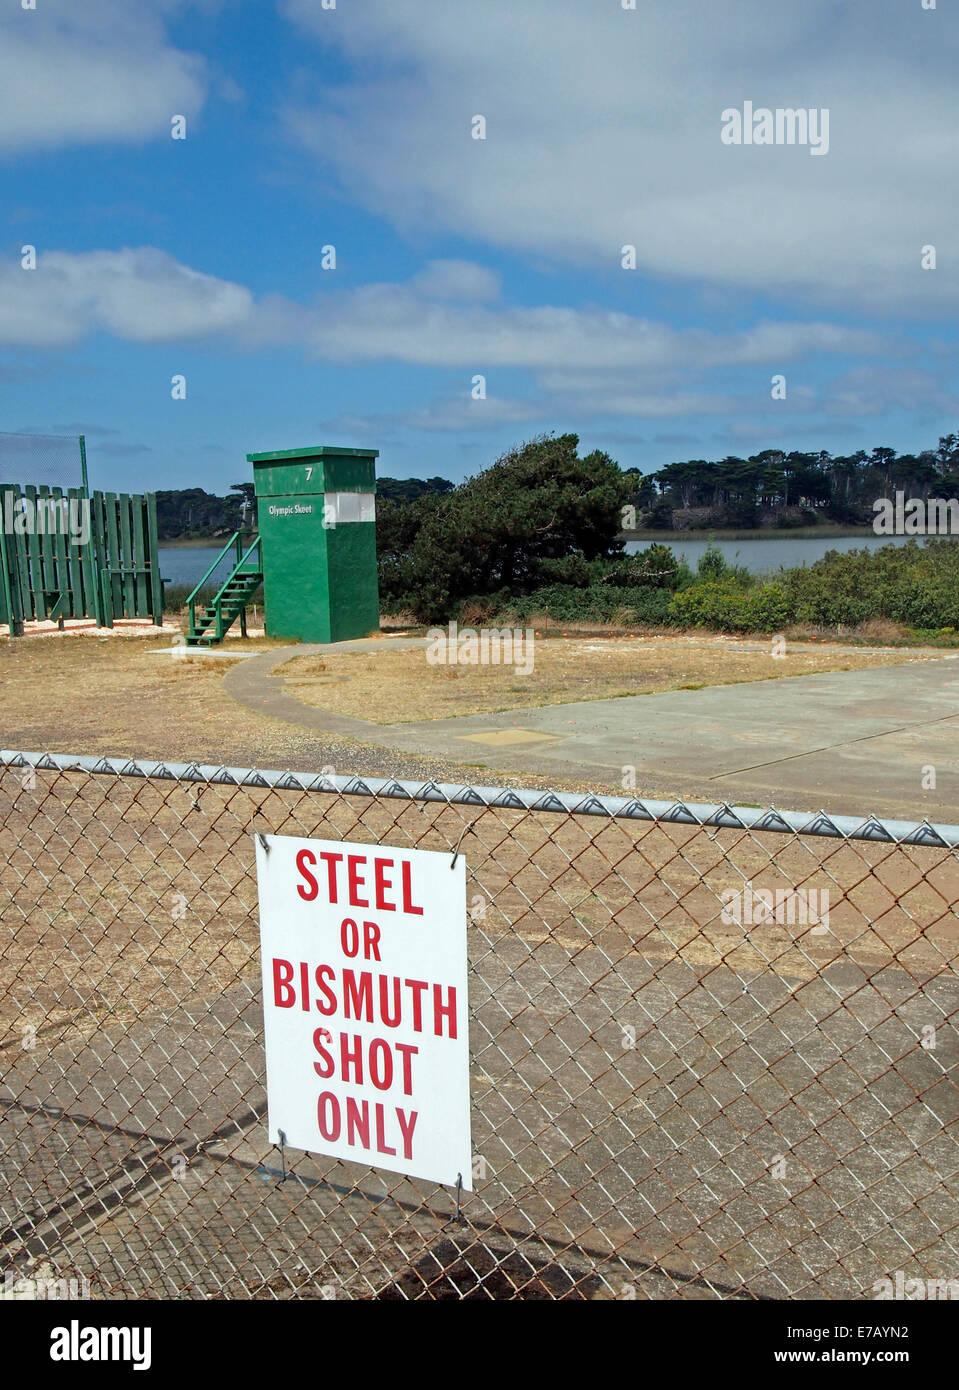 Non toxic or Bismuth shot only sign at shotgun range - Stock Image